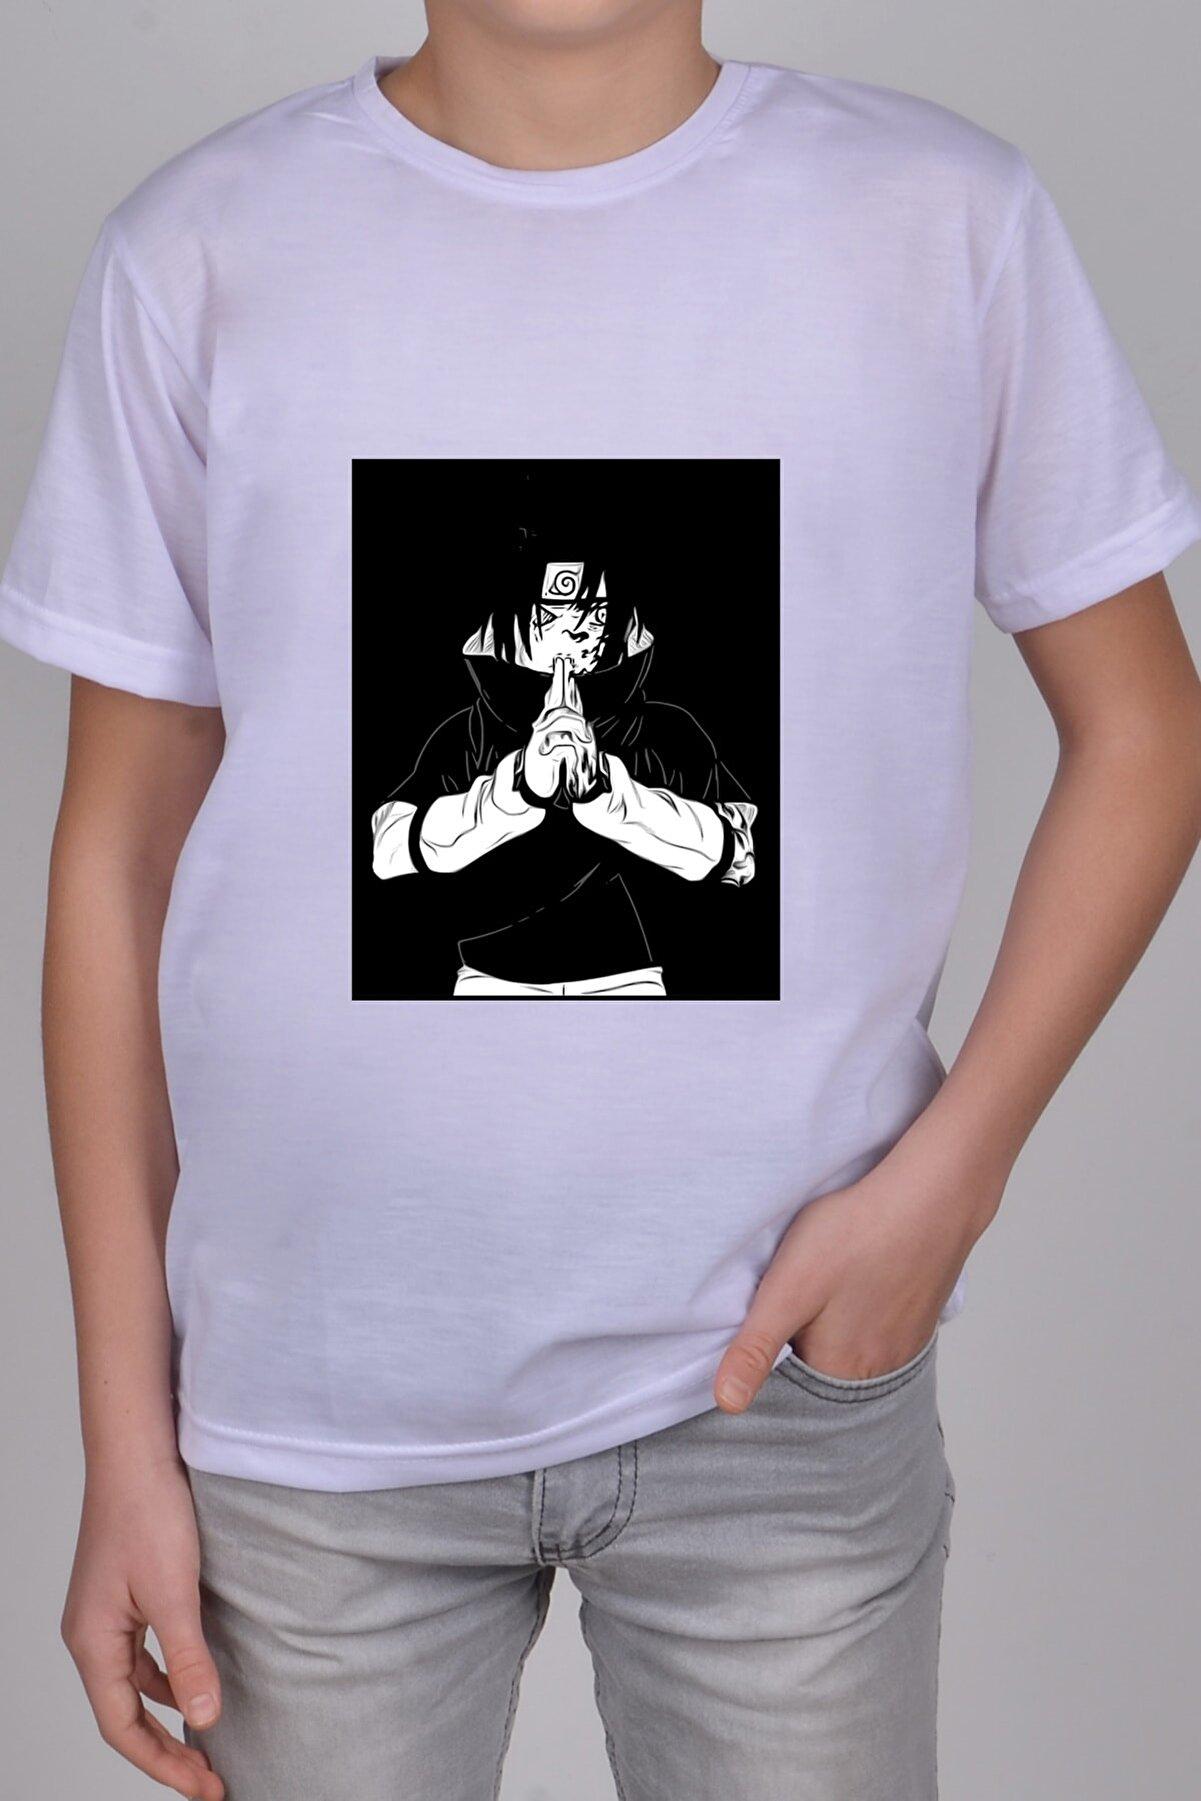 Papatya Tasarım Hediyelik Anime-naruto-çocuk-yetişkin-unisex-t-shirt-anime-naruto-y25